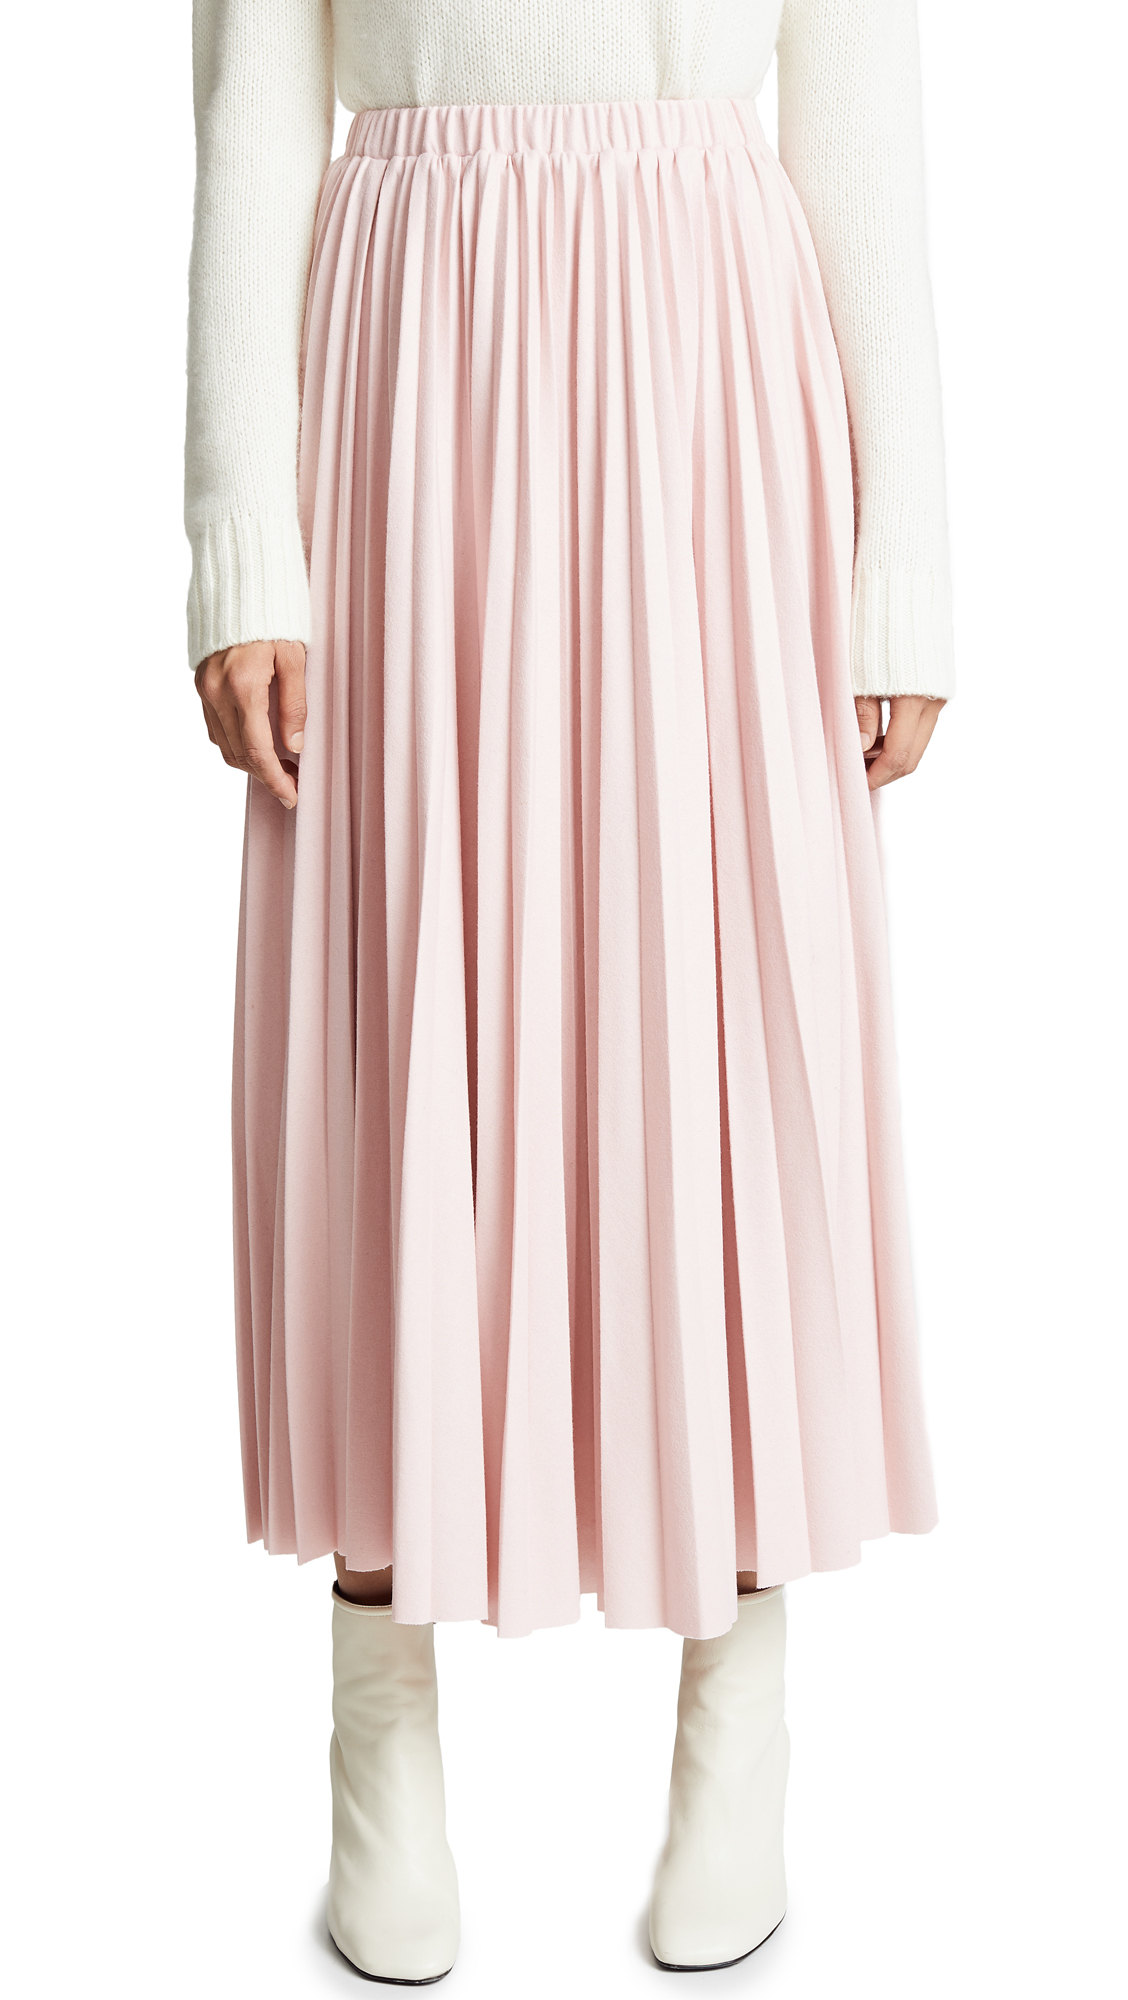 LEHA Accordion Skirt In Pink